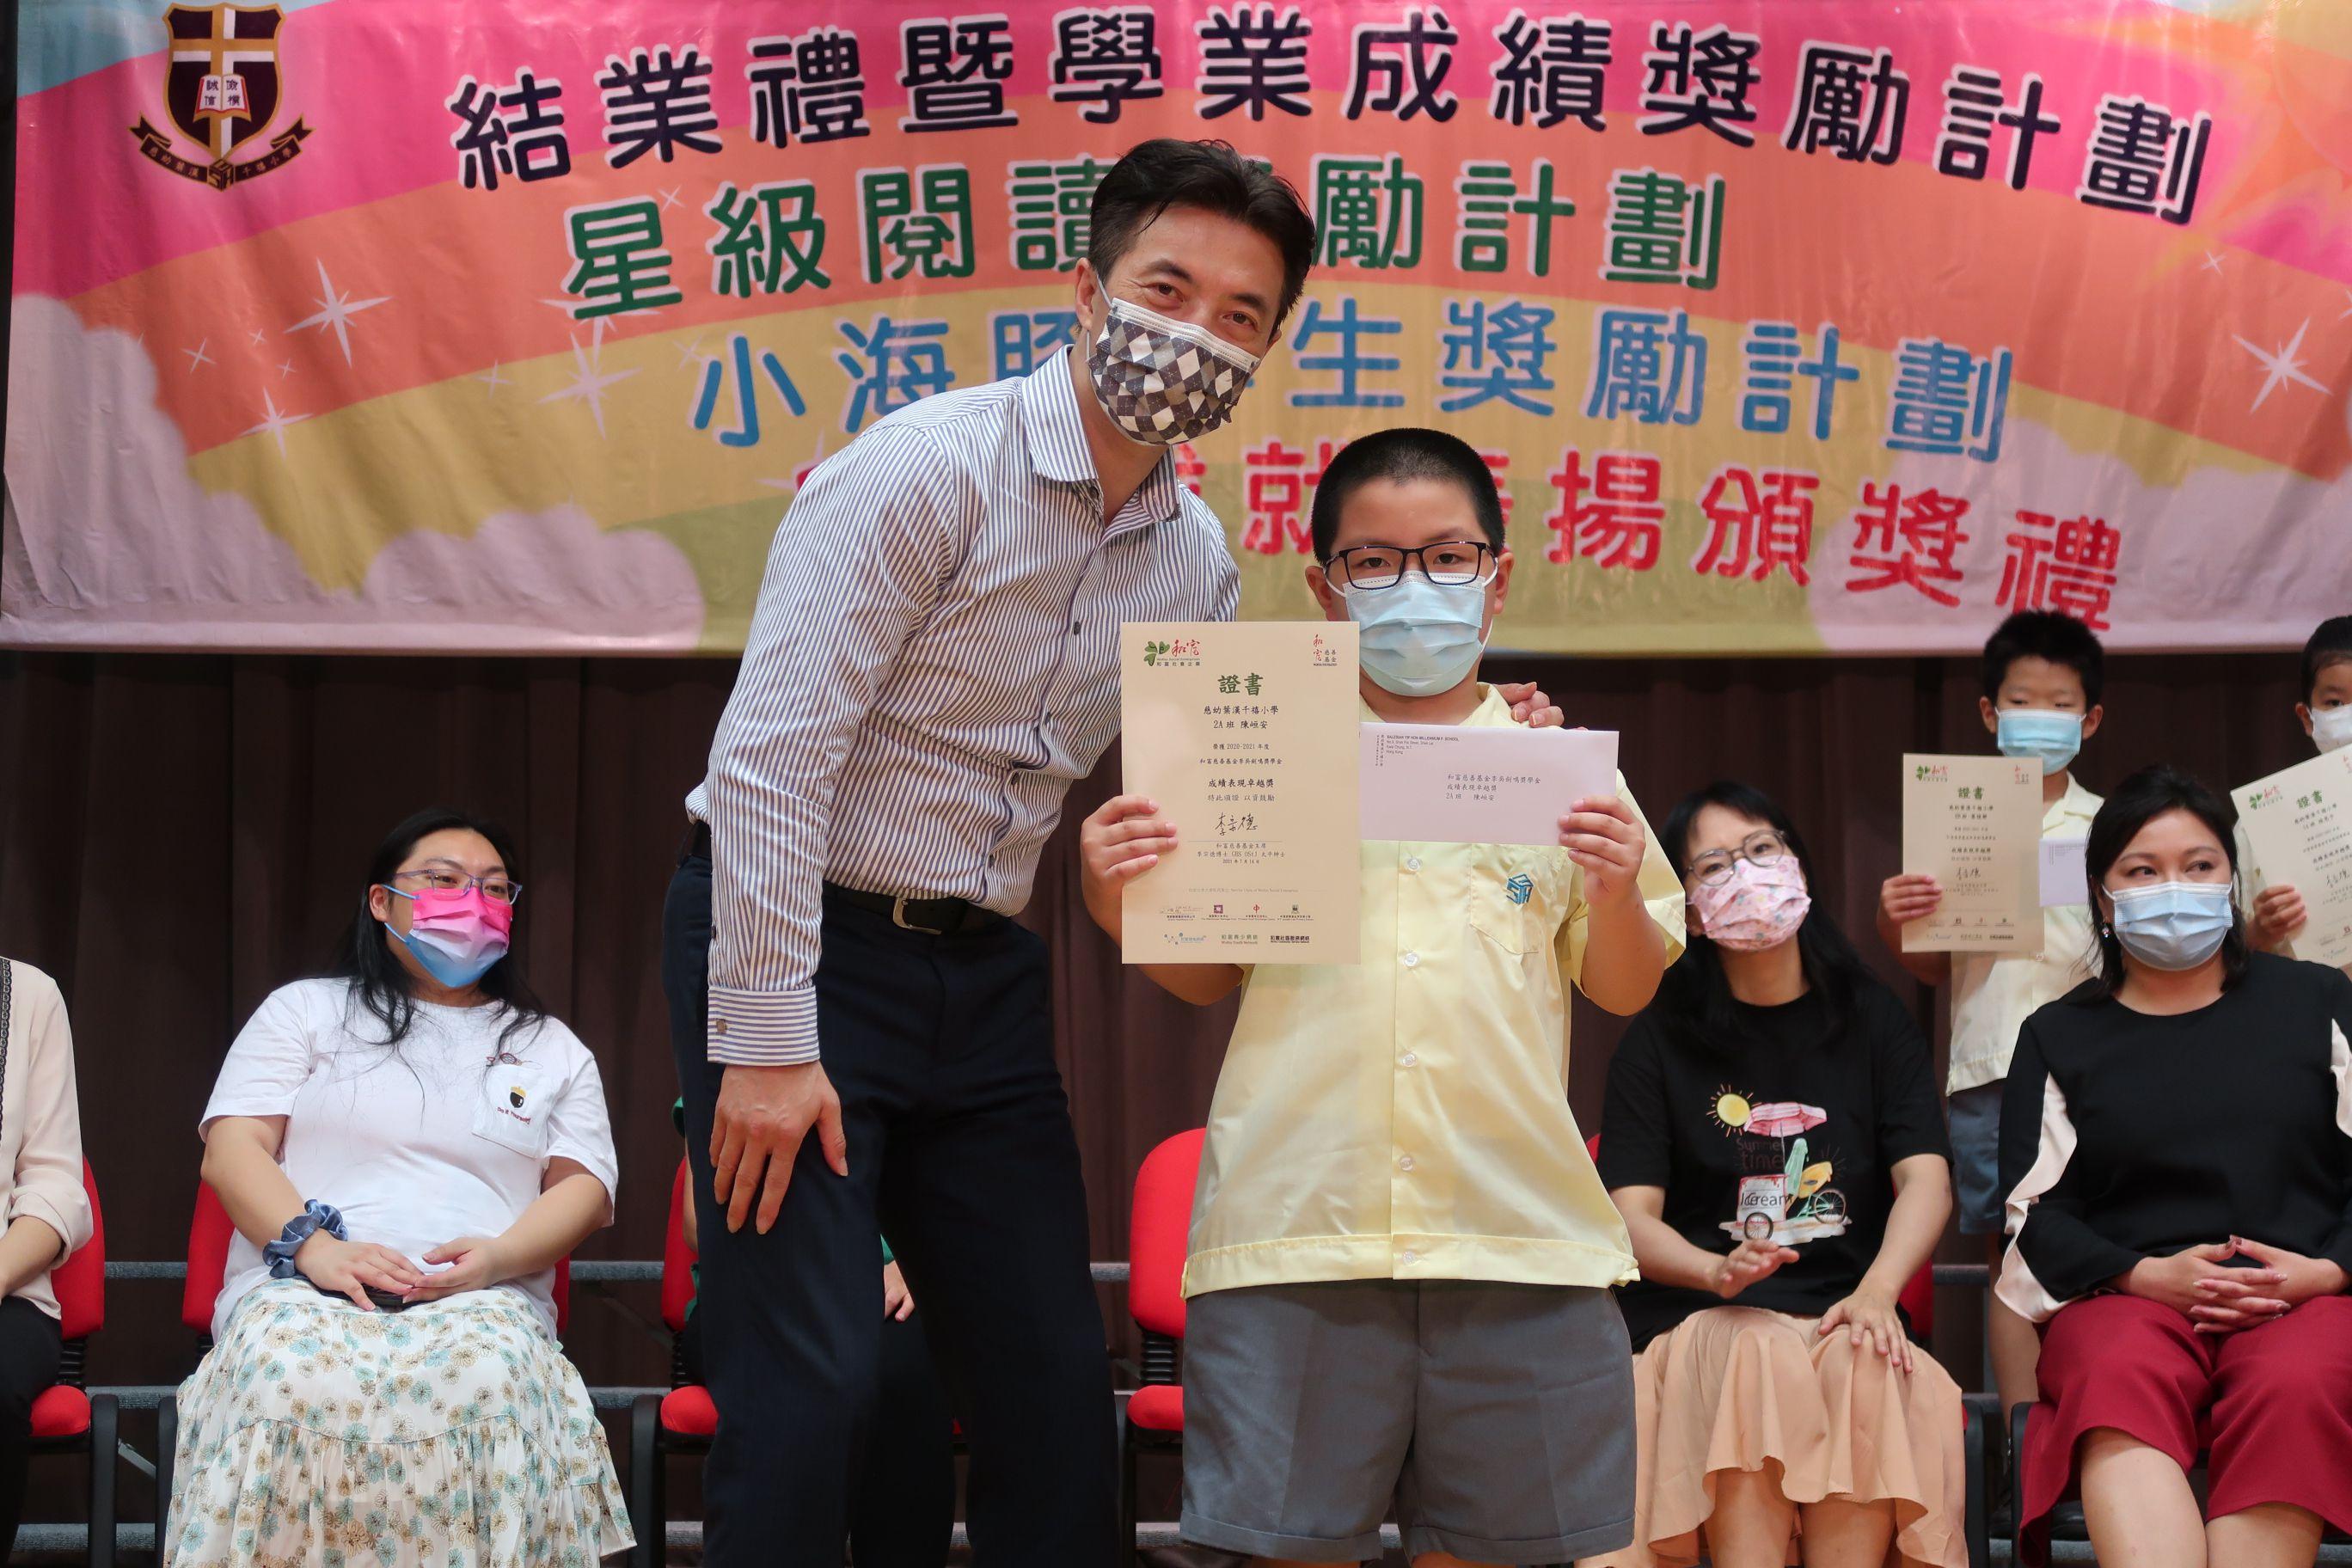 https://syh.edu.hk/sites/default/files/img_5931.jpg